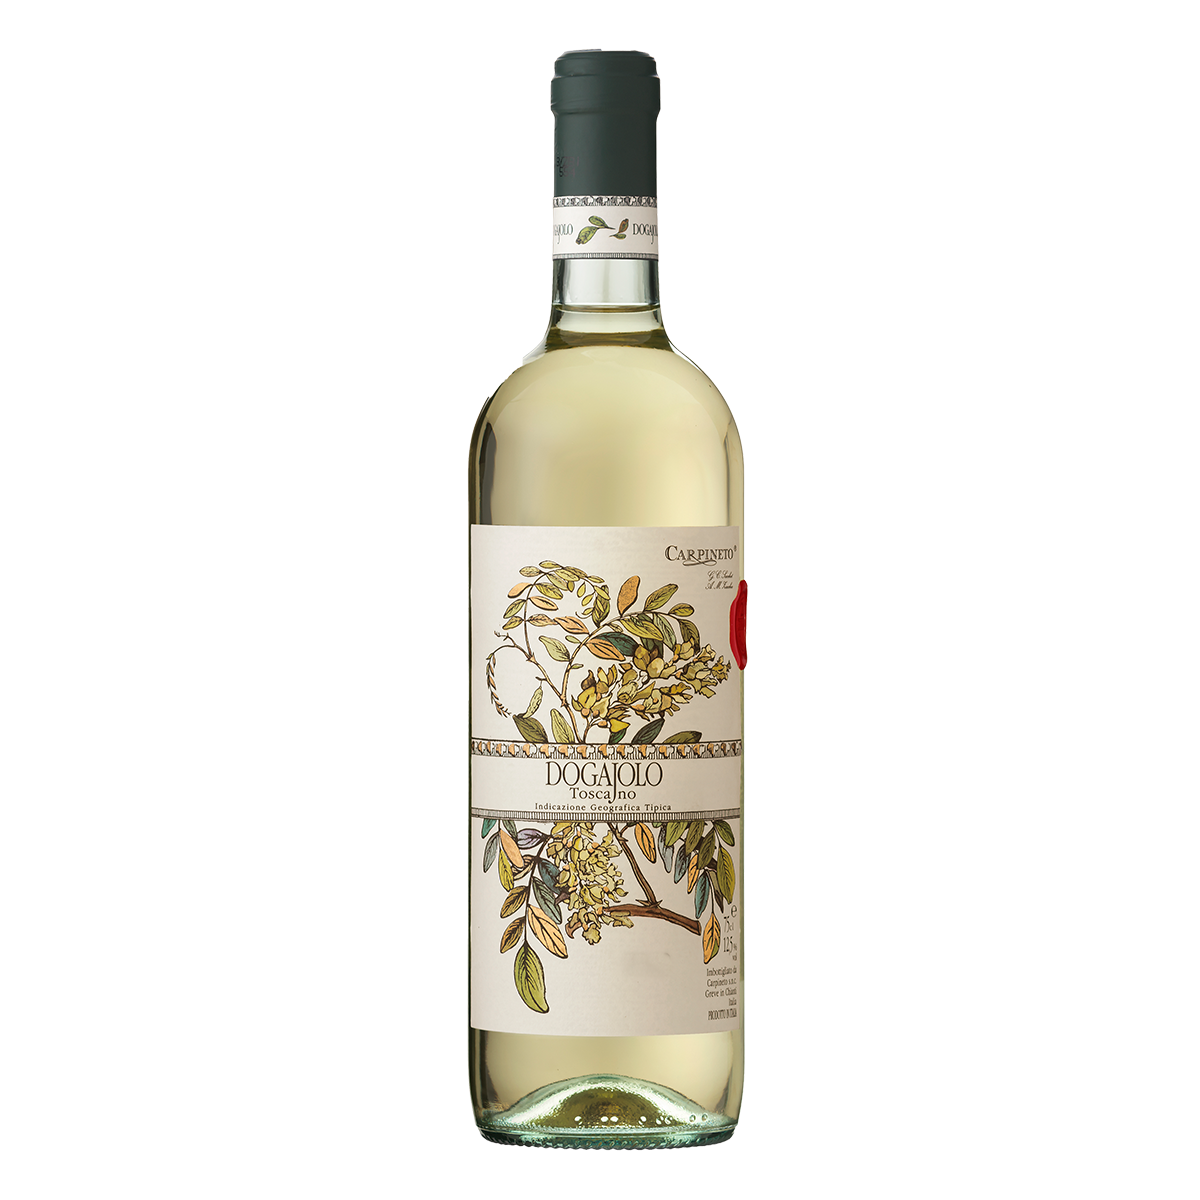 ITTC2204 義大利卡品耐托度佳歐高級白葡萄酒 Carpineto Dogajolo Bianco Toscano I.G.T. (750ml)